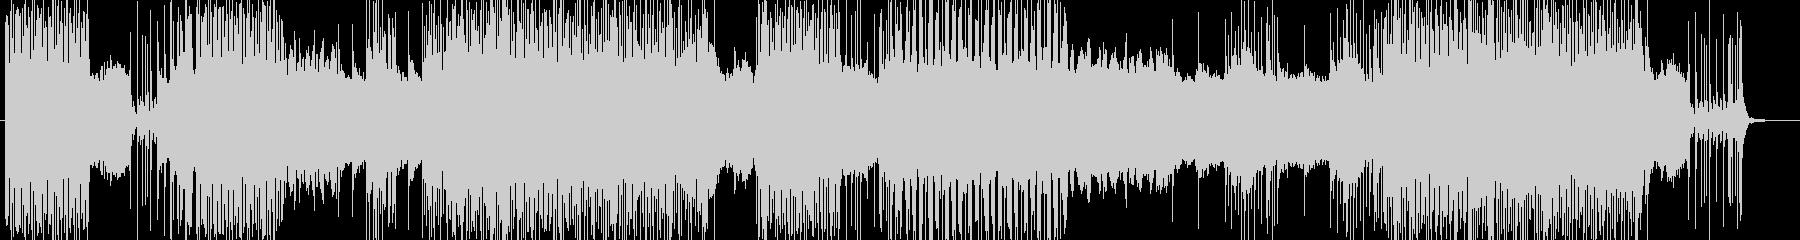 「HR/HM」「METAL」BGM226の未再生の波形